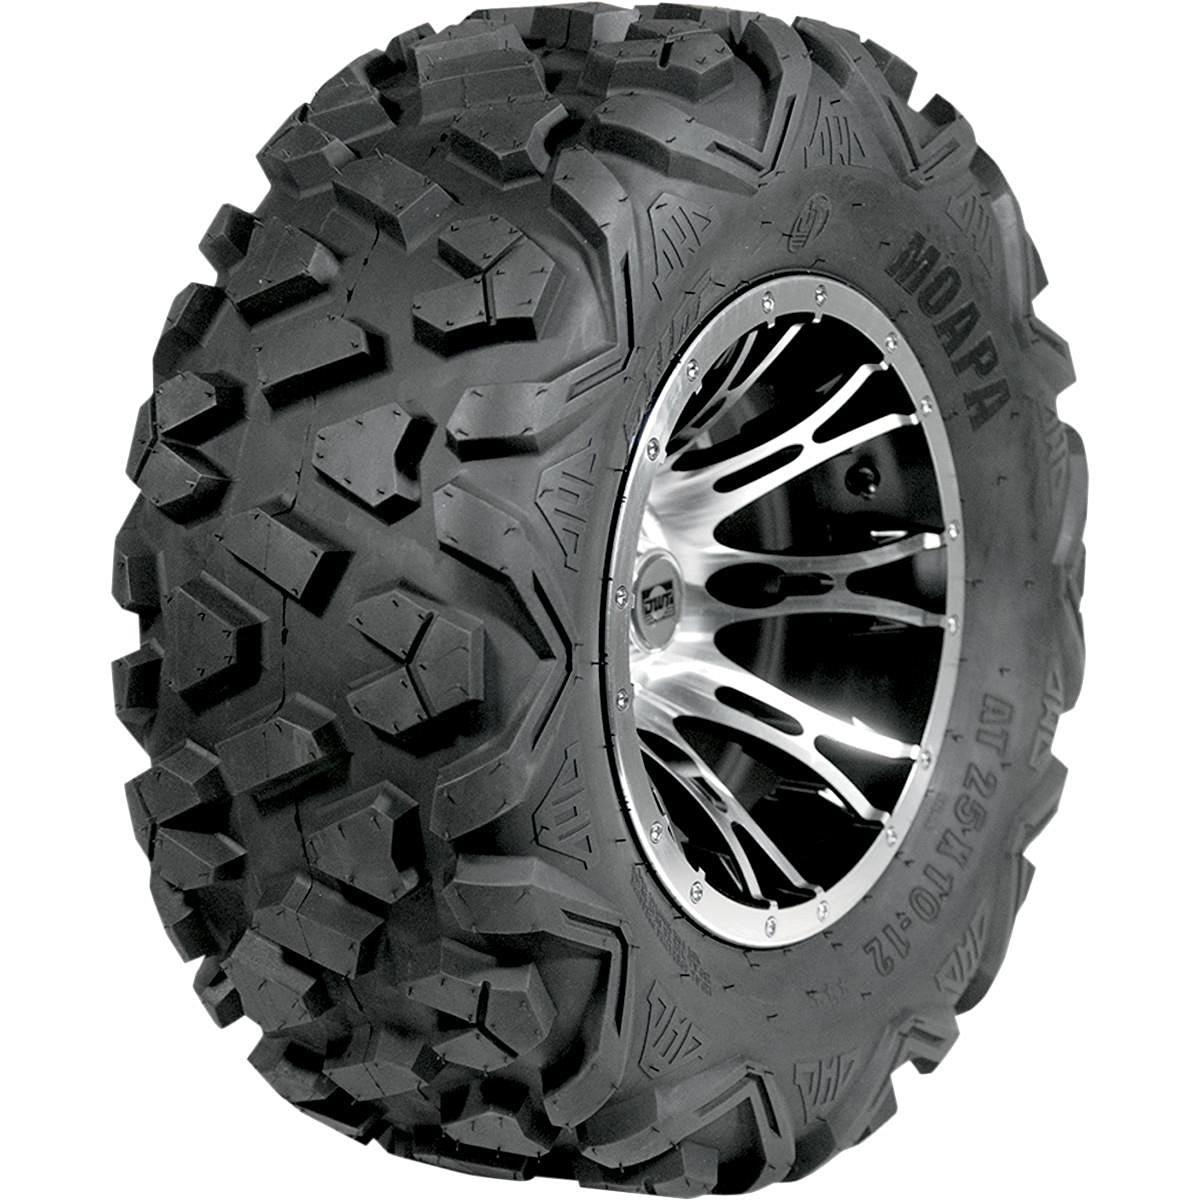 Douglas Wheel Moapa Run-Flat Utility Tire - 26x9x14 , Position: Front/Rear, Rim Size: 14, Tire Application: All-Terrain, Tire Size: 26x9x14, Tire Type: ATV/UTV, Tire Construction: Bias, Tire Ply: 12 UT-261-12